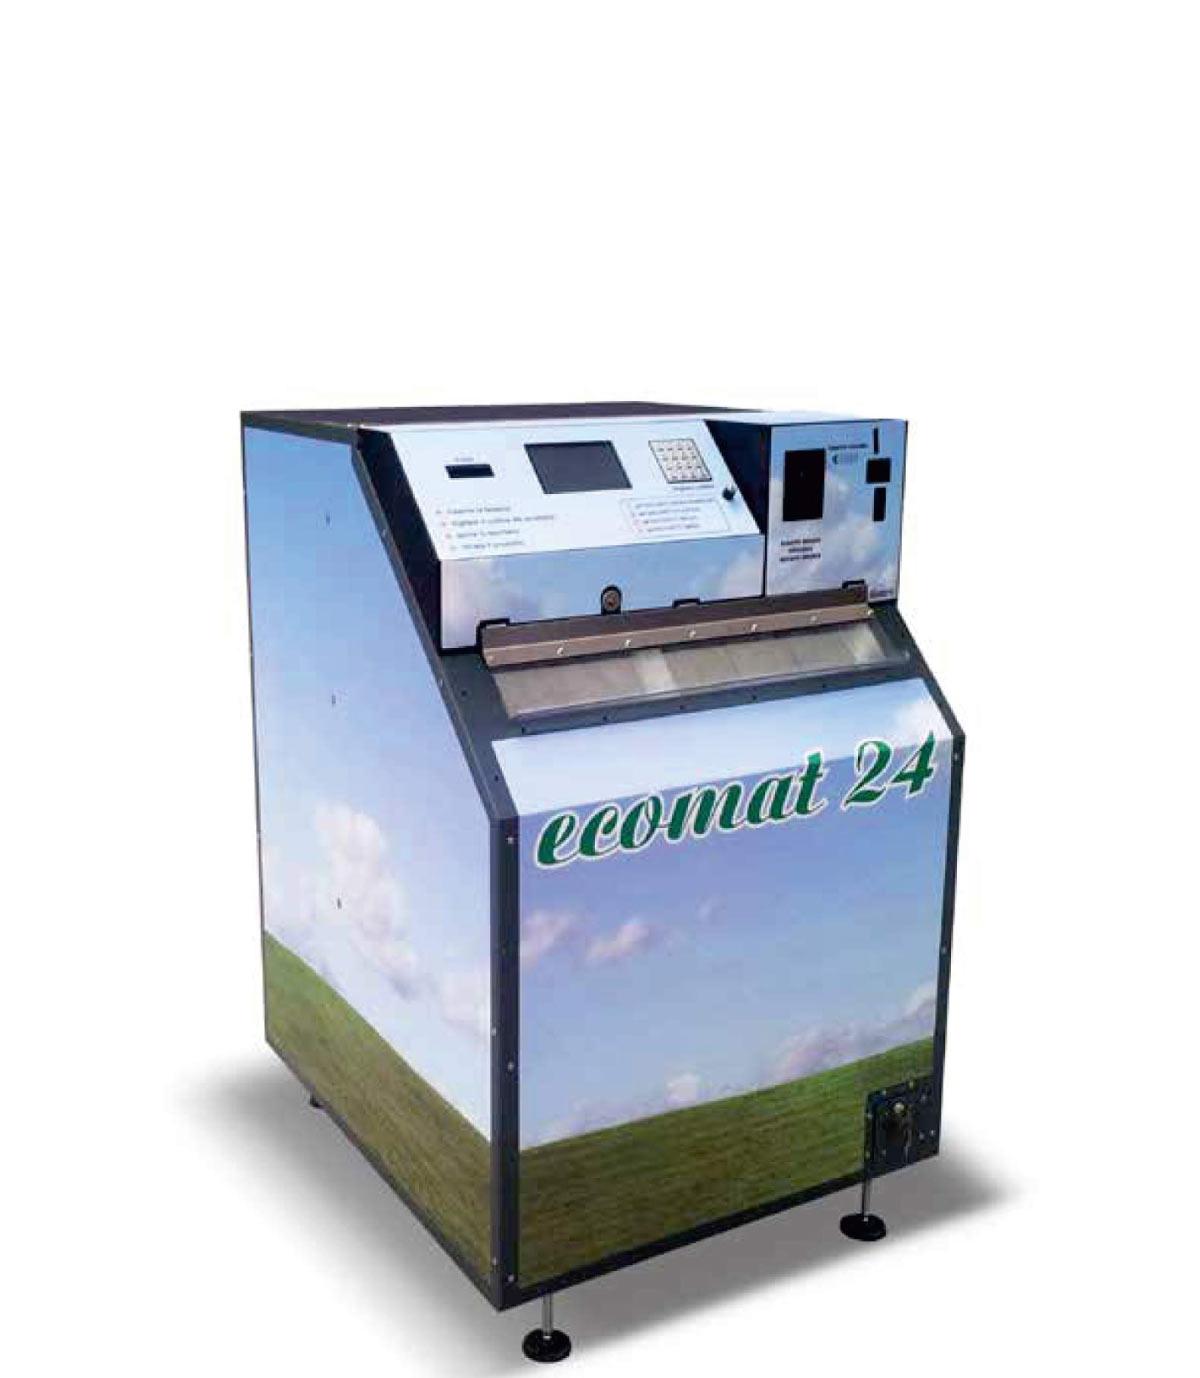 ECOMAT24 Standard - Daint srl Distributori Automatici